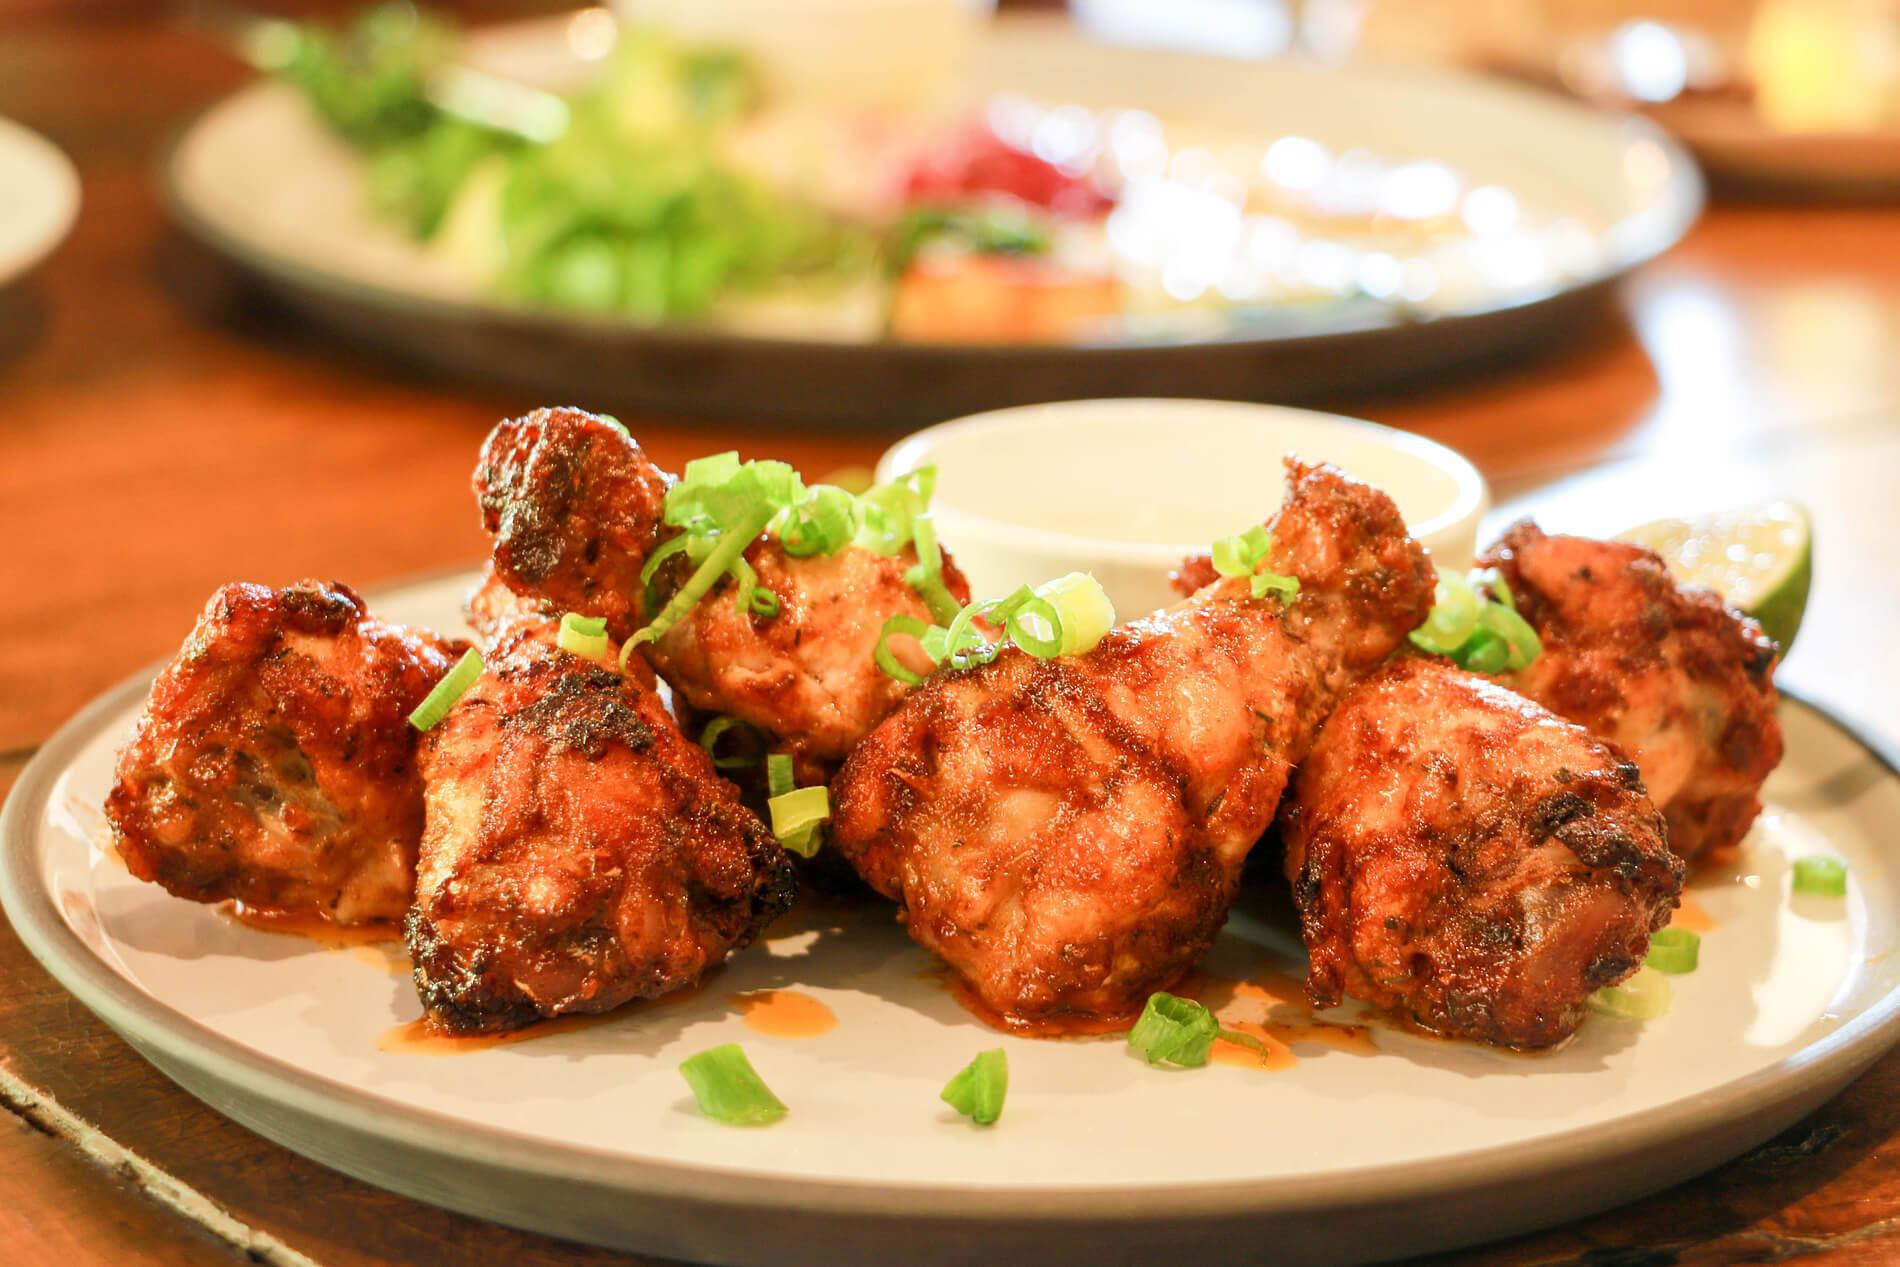 Halal Food blogger bridging cultural gaps in America